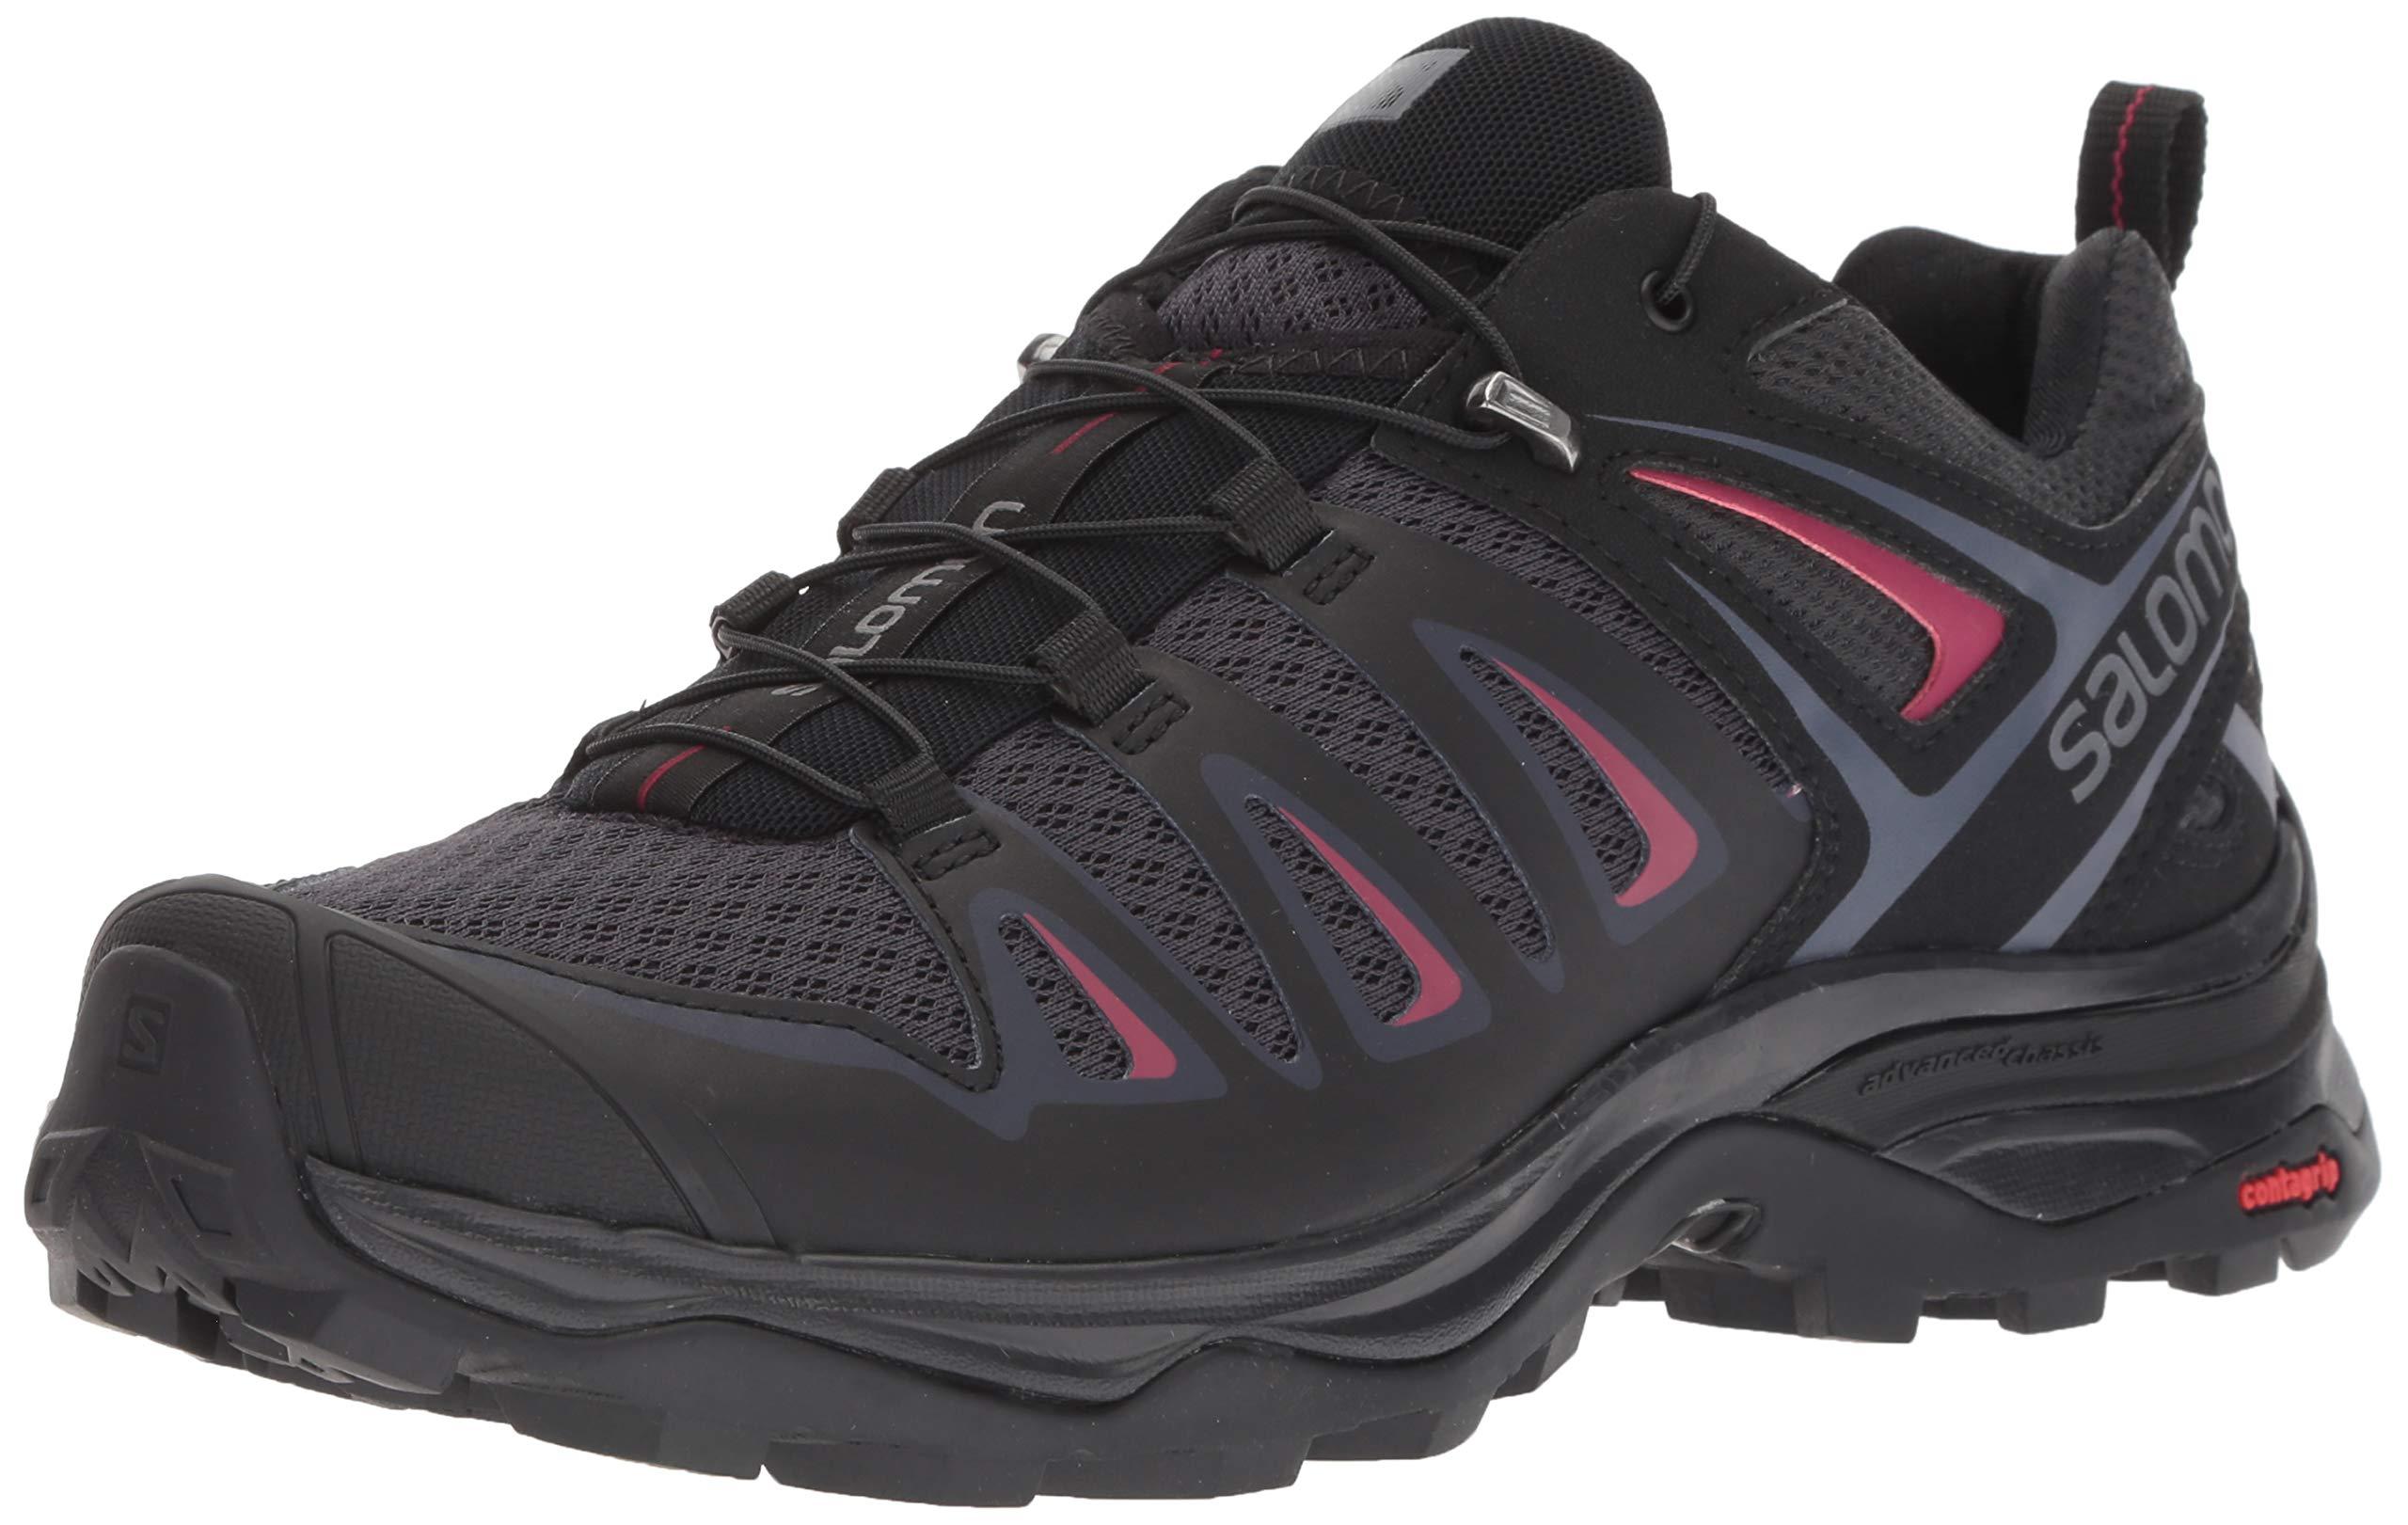 SALOMON Women's X Ultra 3 W Trail Running Shoe, Graphite/Black/Citronelle, 11 M US by SALOMON